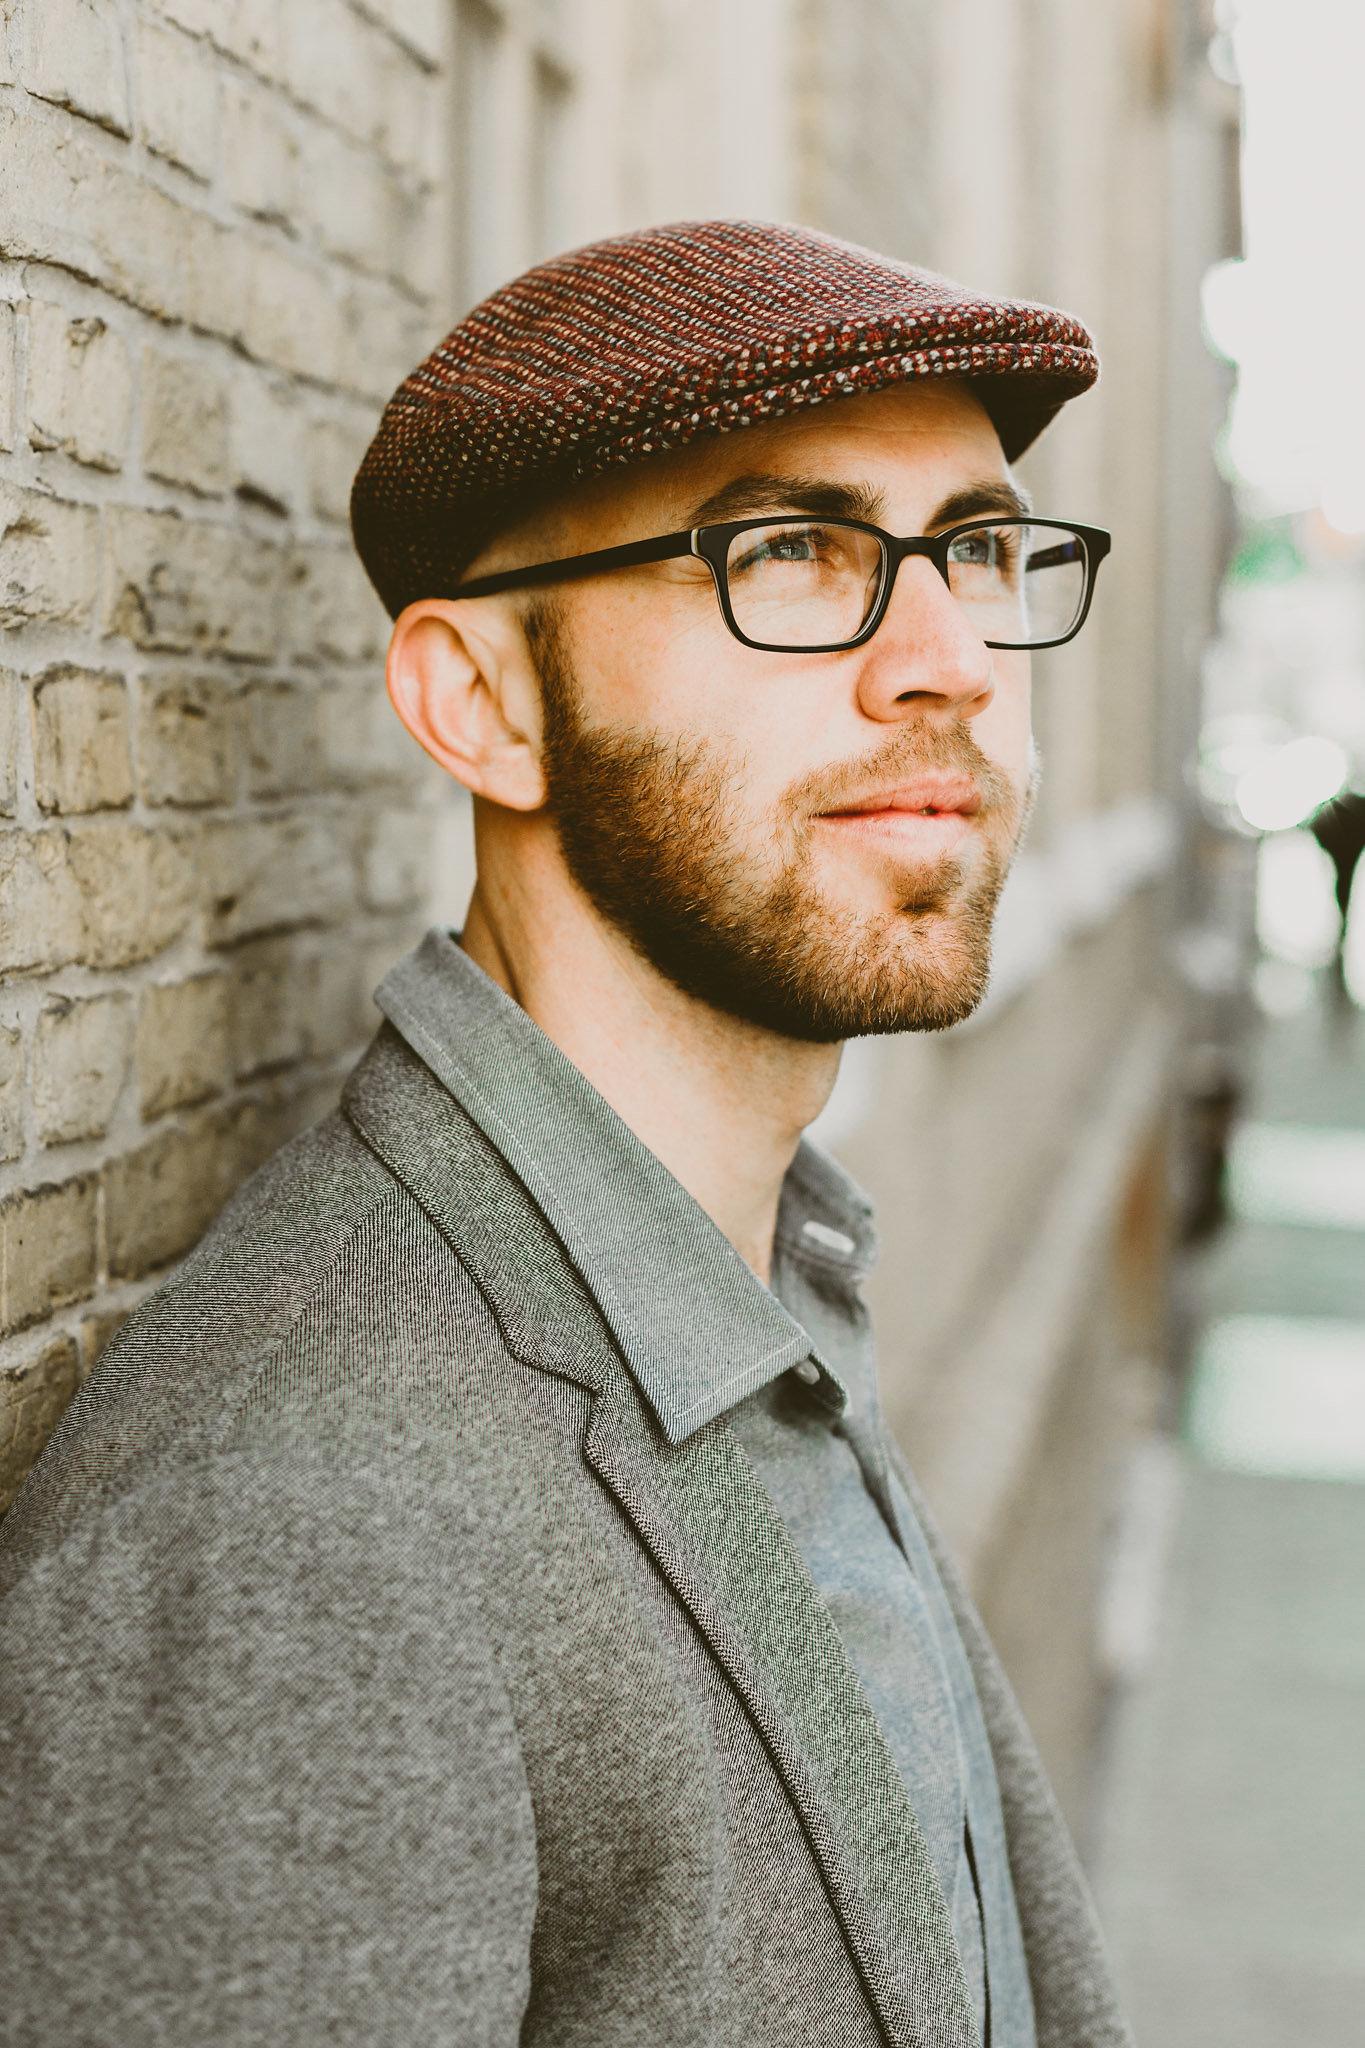 Jacob_Portraits-47.jpg